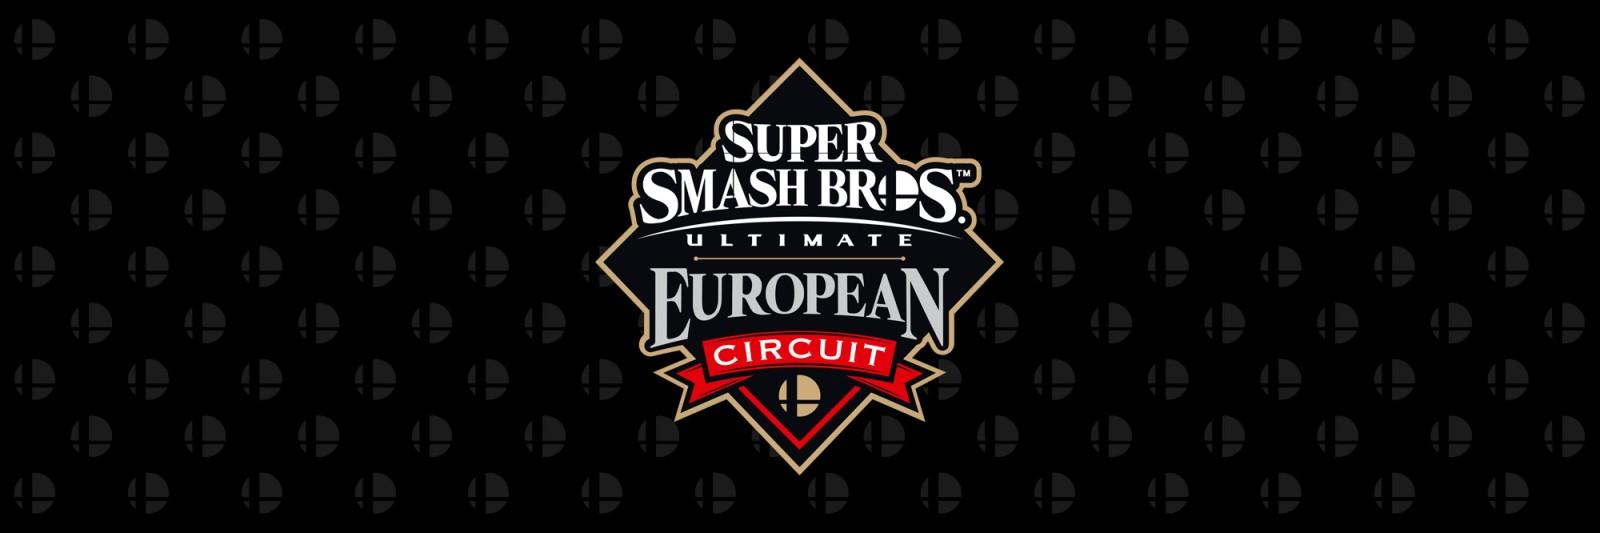 H3x1_SSBU_TournamentPortal_EuropeanCircuitLogo.jpg